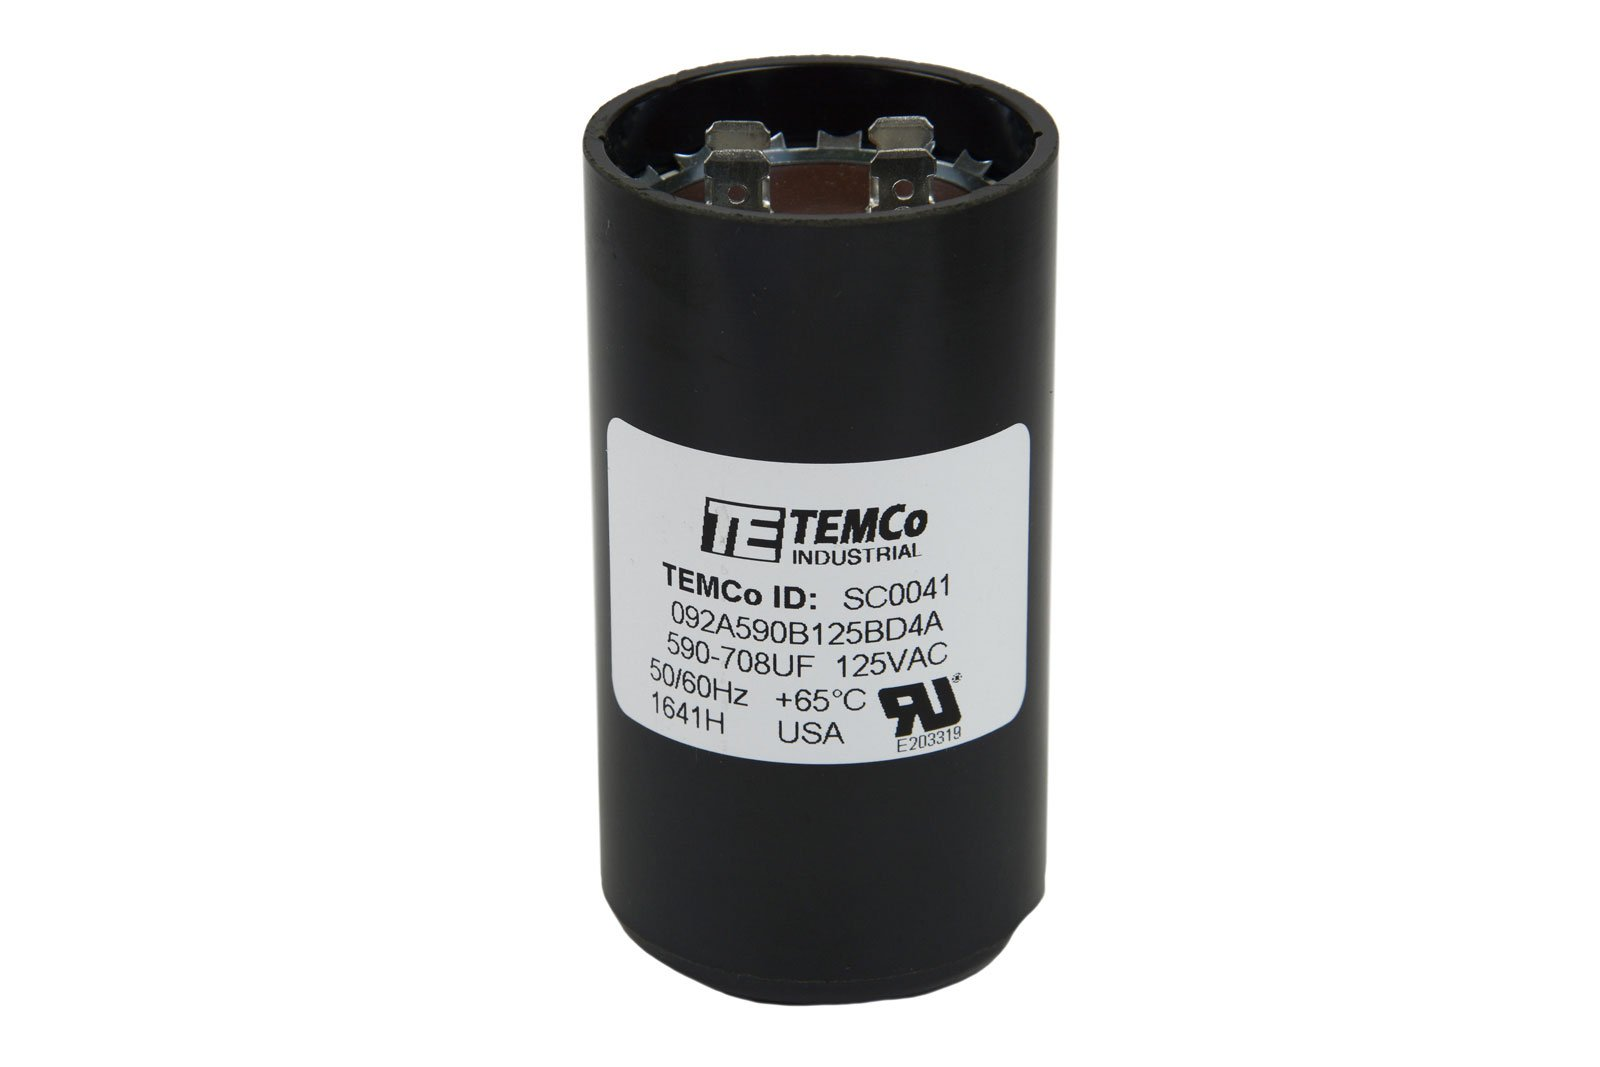 TEMCo Motor Start Capacitor SC0041-590-708 mfd 110-125 V VAC Volt uf Round HVAC AC Electric